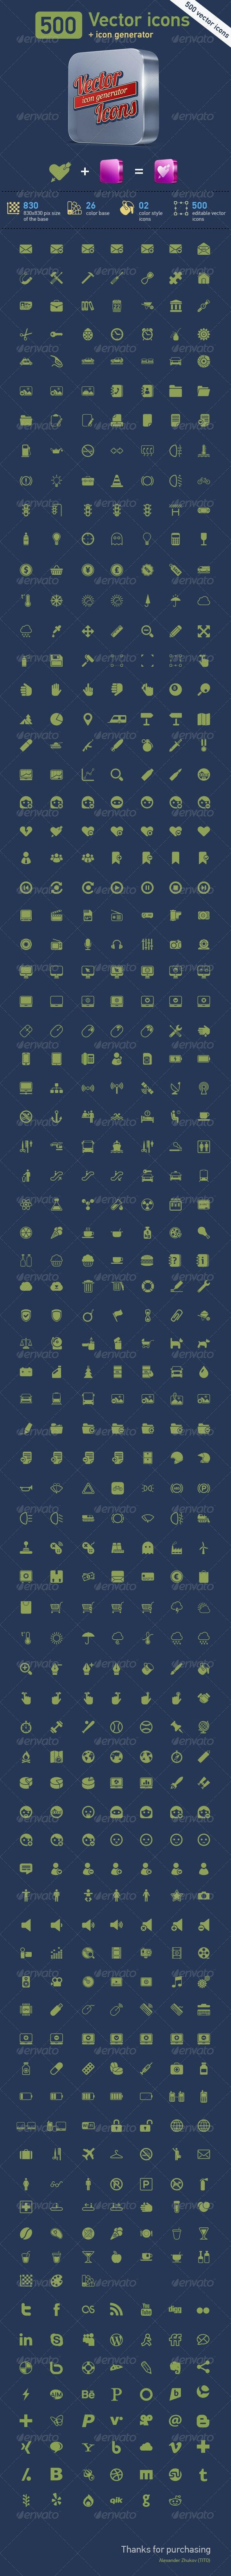 500 Vector Icons + Icon Generator - Web Icons